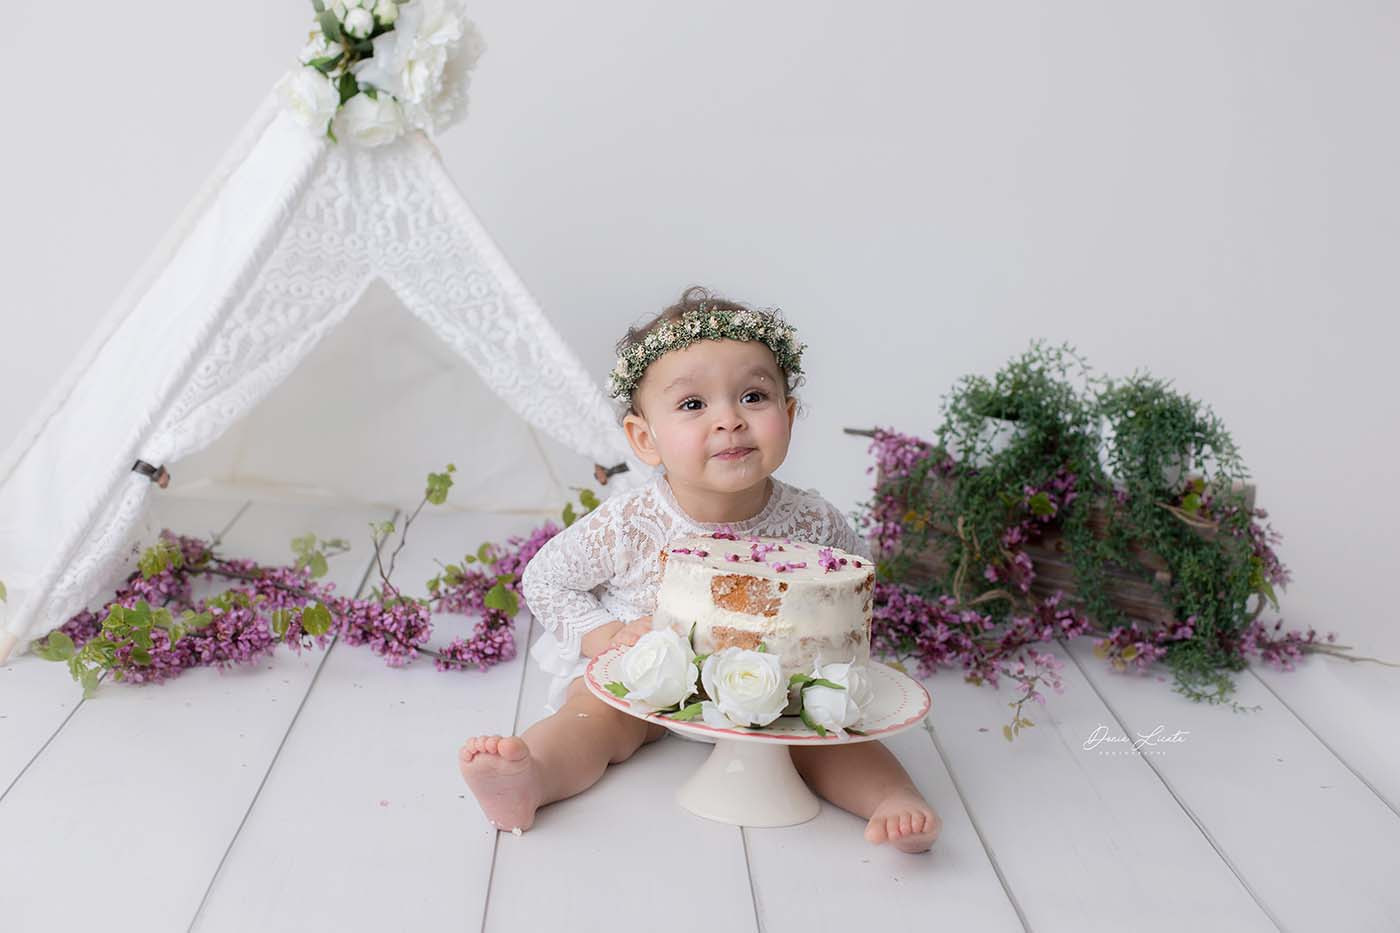 séance photo smash the cake marseille